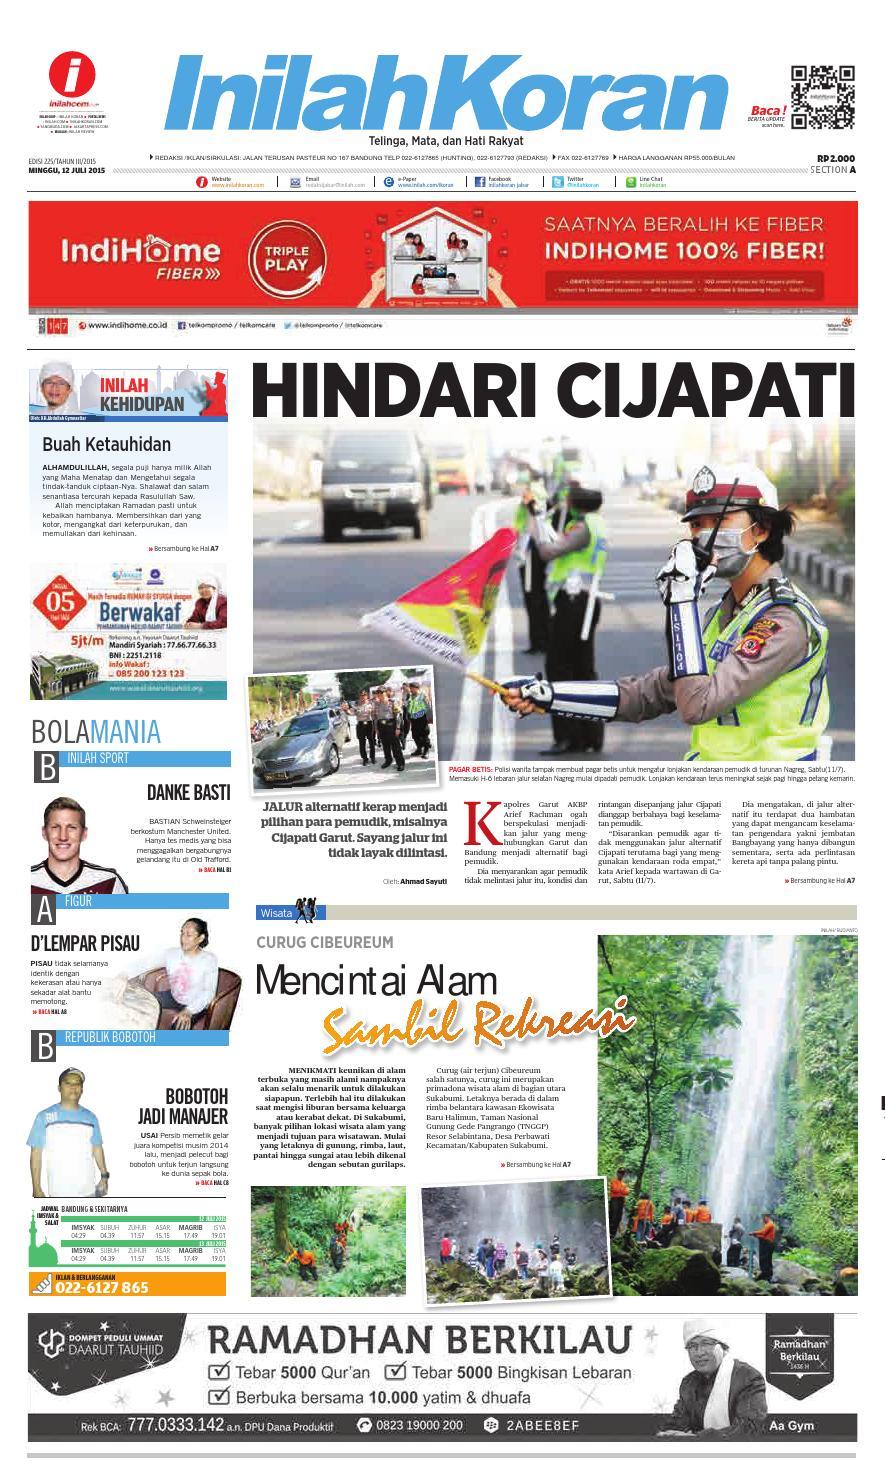 Hindari Cijapati By Inilah Koran Issuu Produk Ukm Bumn Bahan Songket Sulam Katun Merah